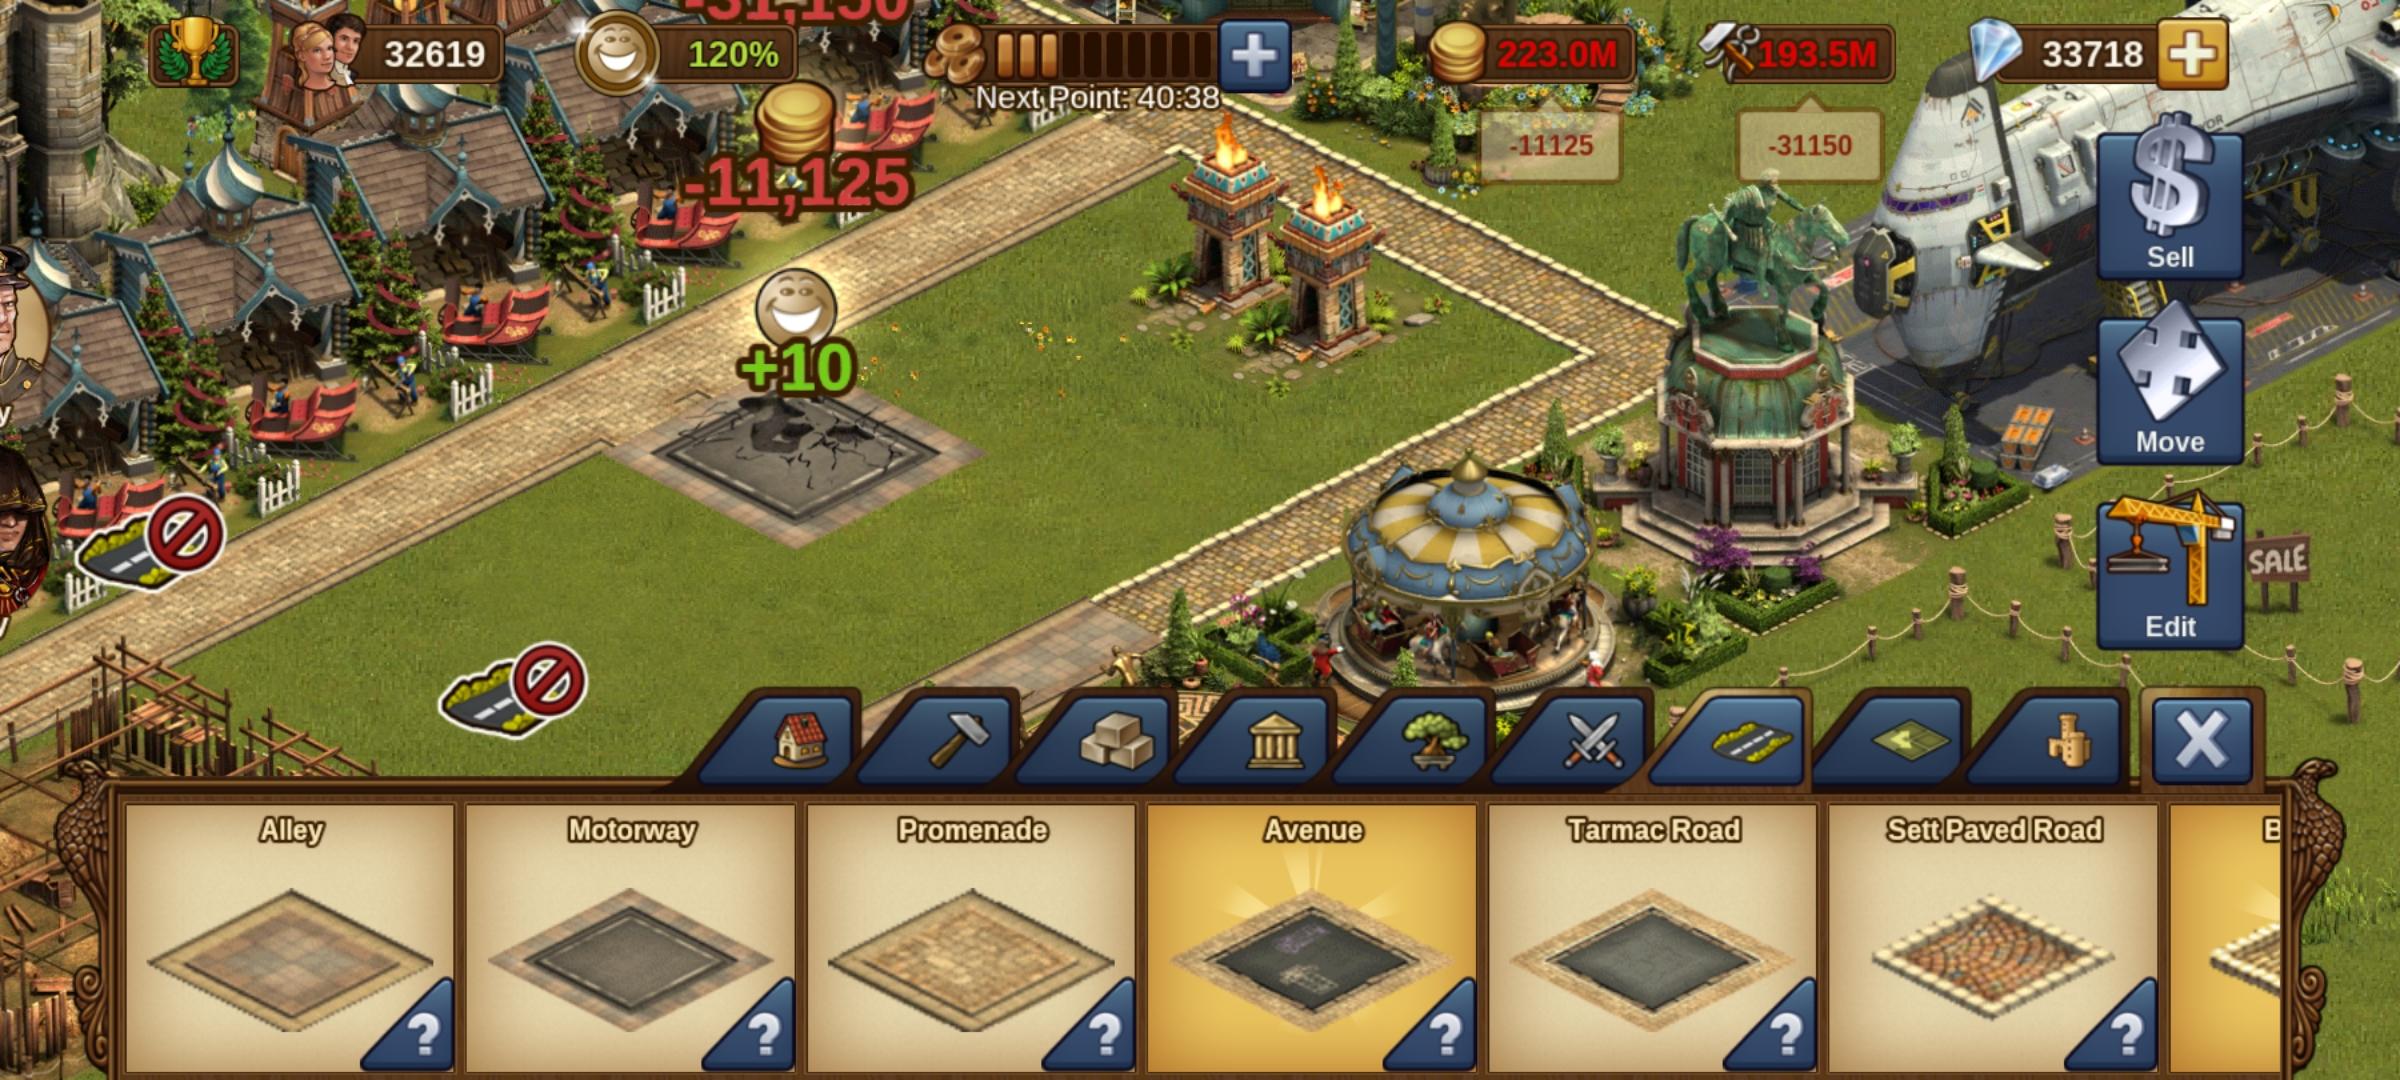 Screenshot_20210319-120206_Forge of Empires.jpg